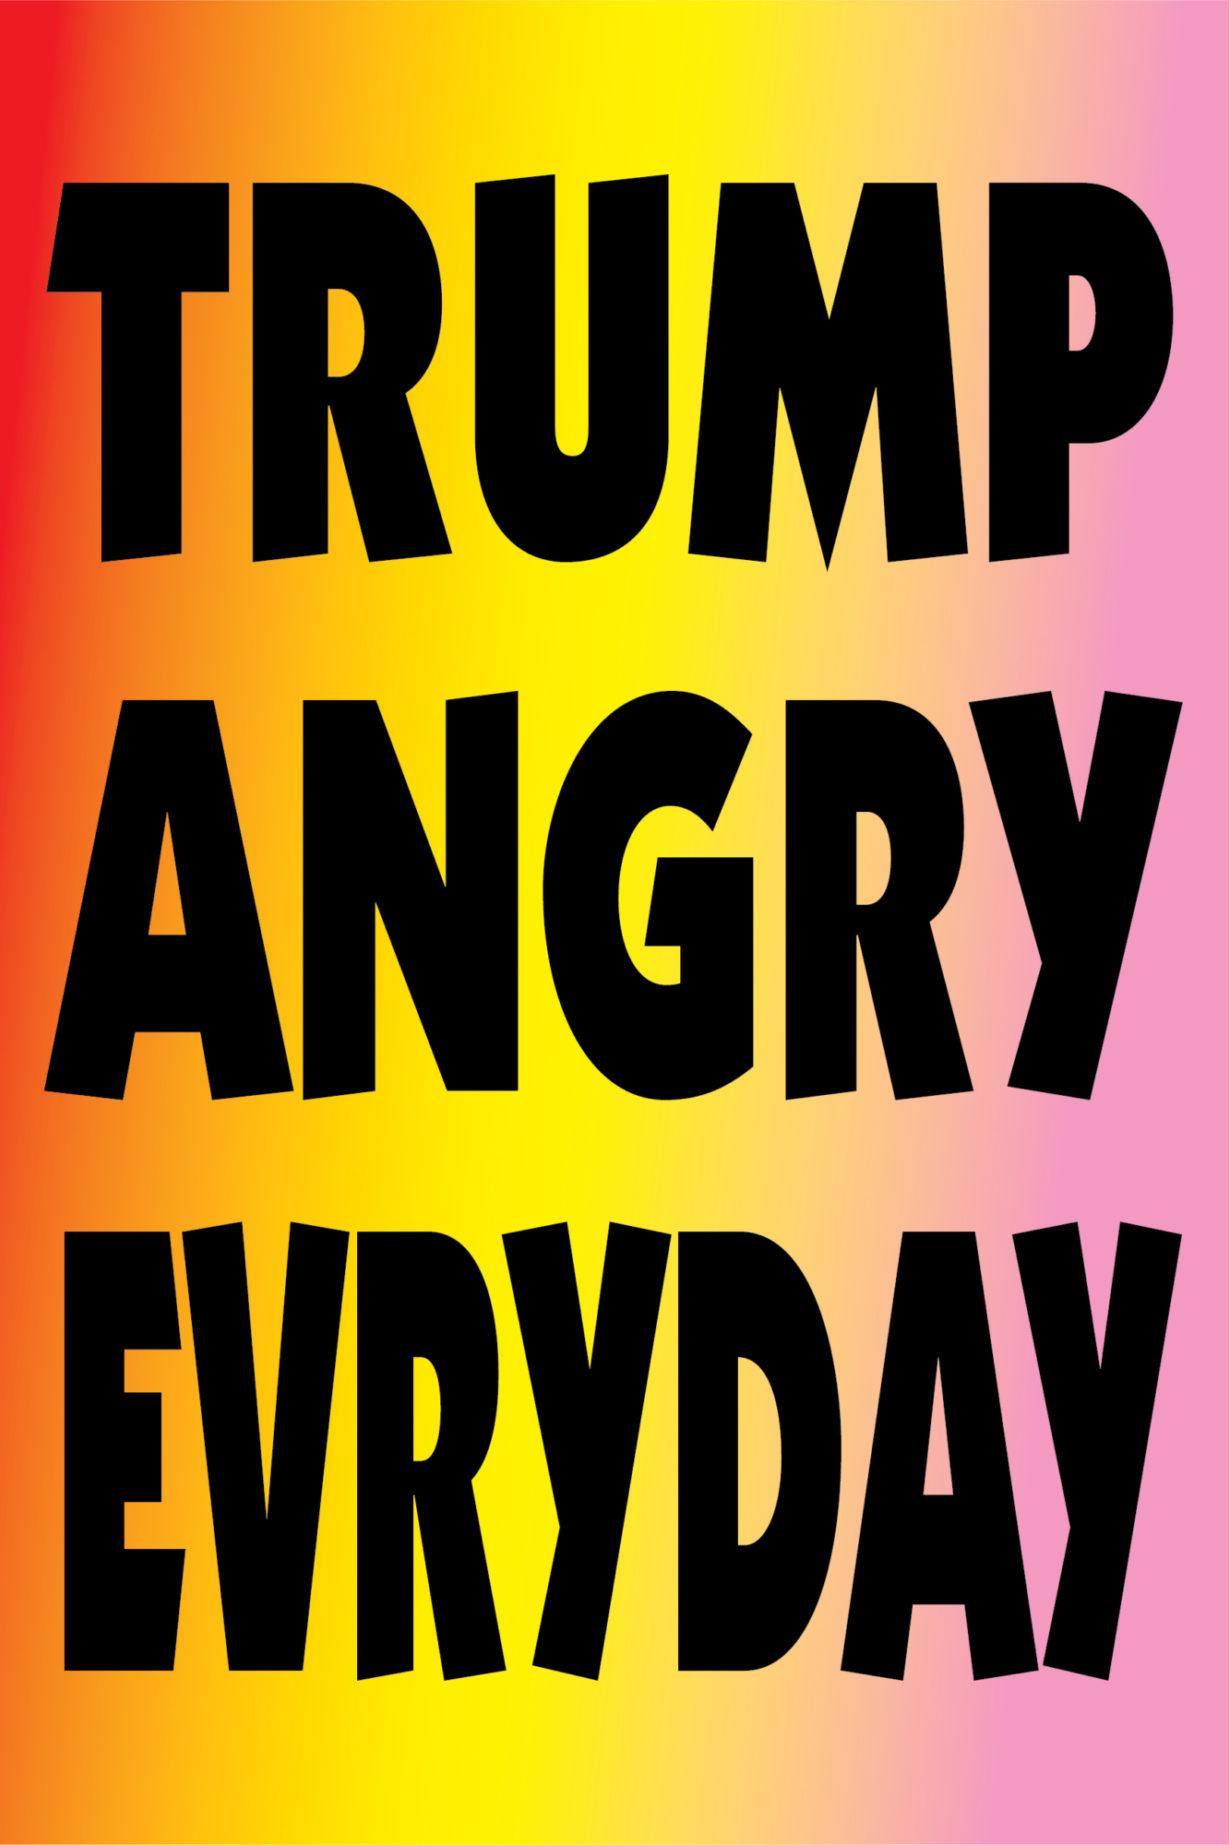 NP_26_50_2017_Trump-Angry-Everyday.jpg